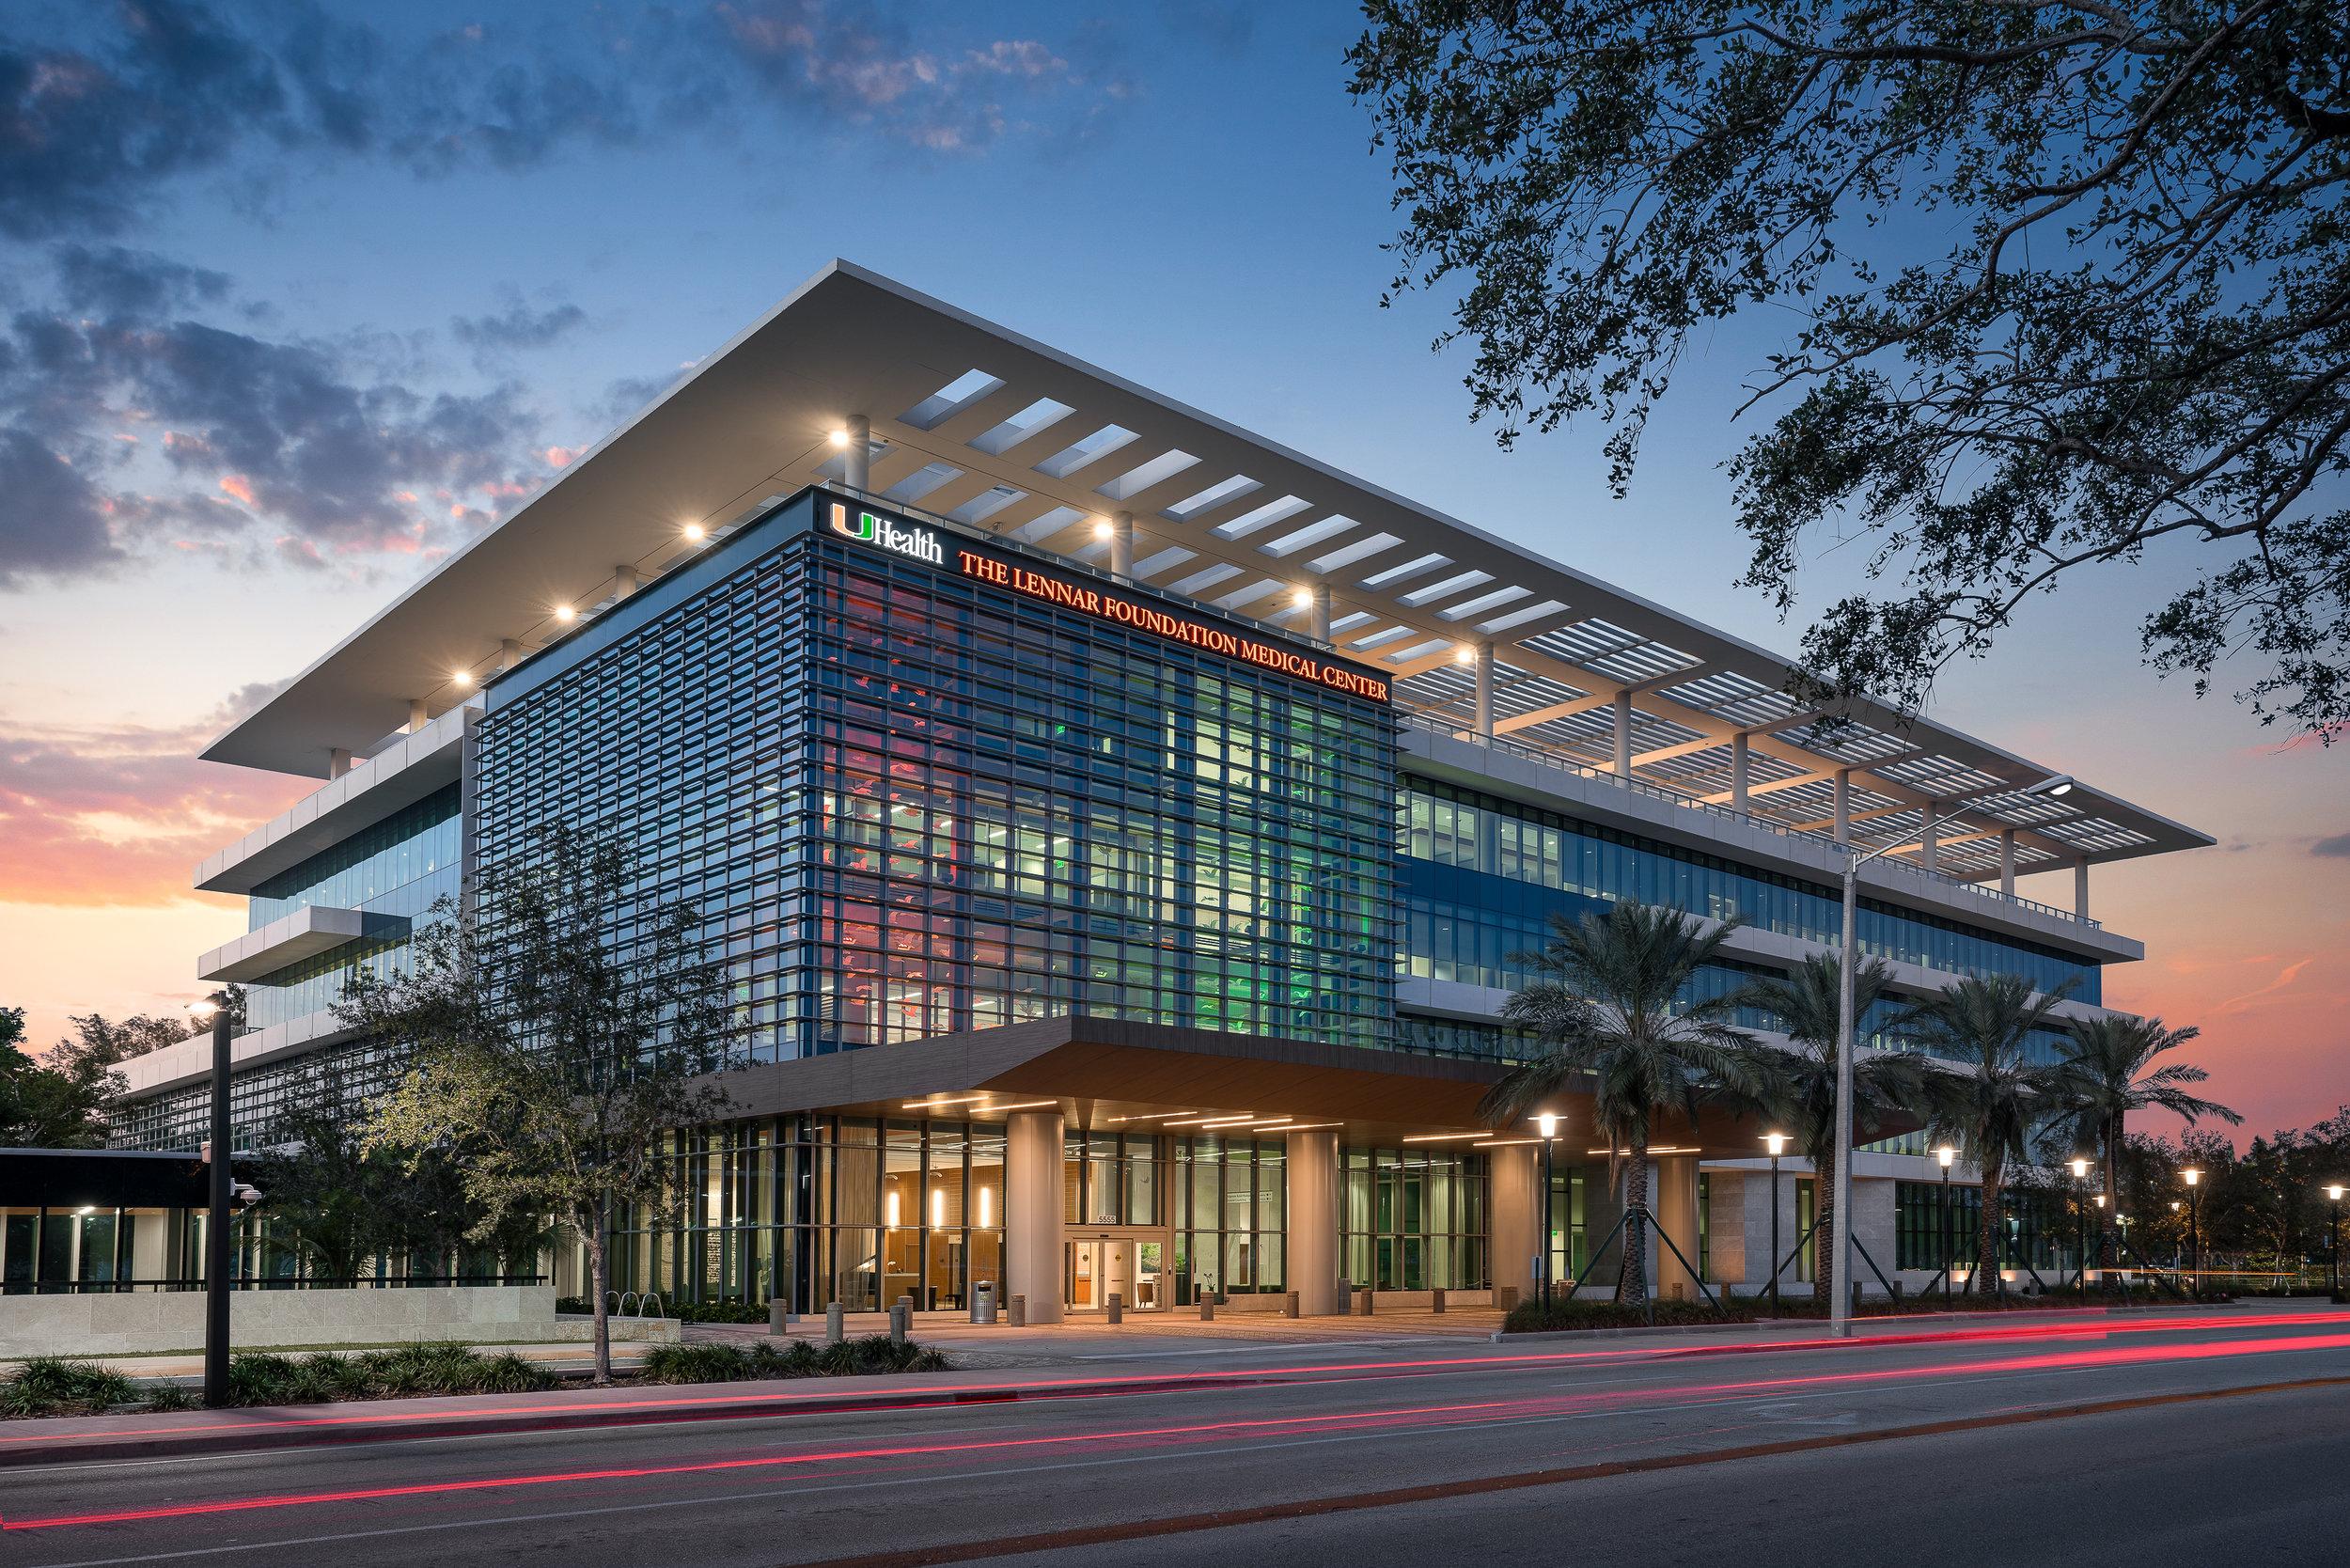 University of Miami The Lennar Medical Center: Miami, FL